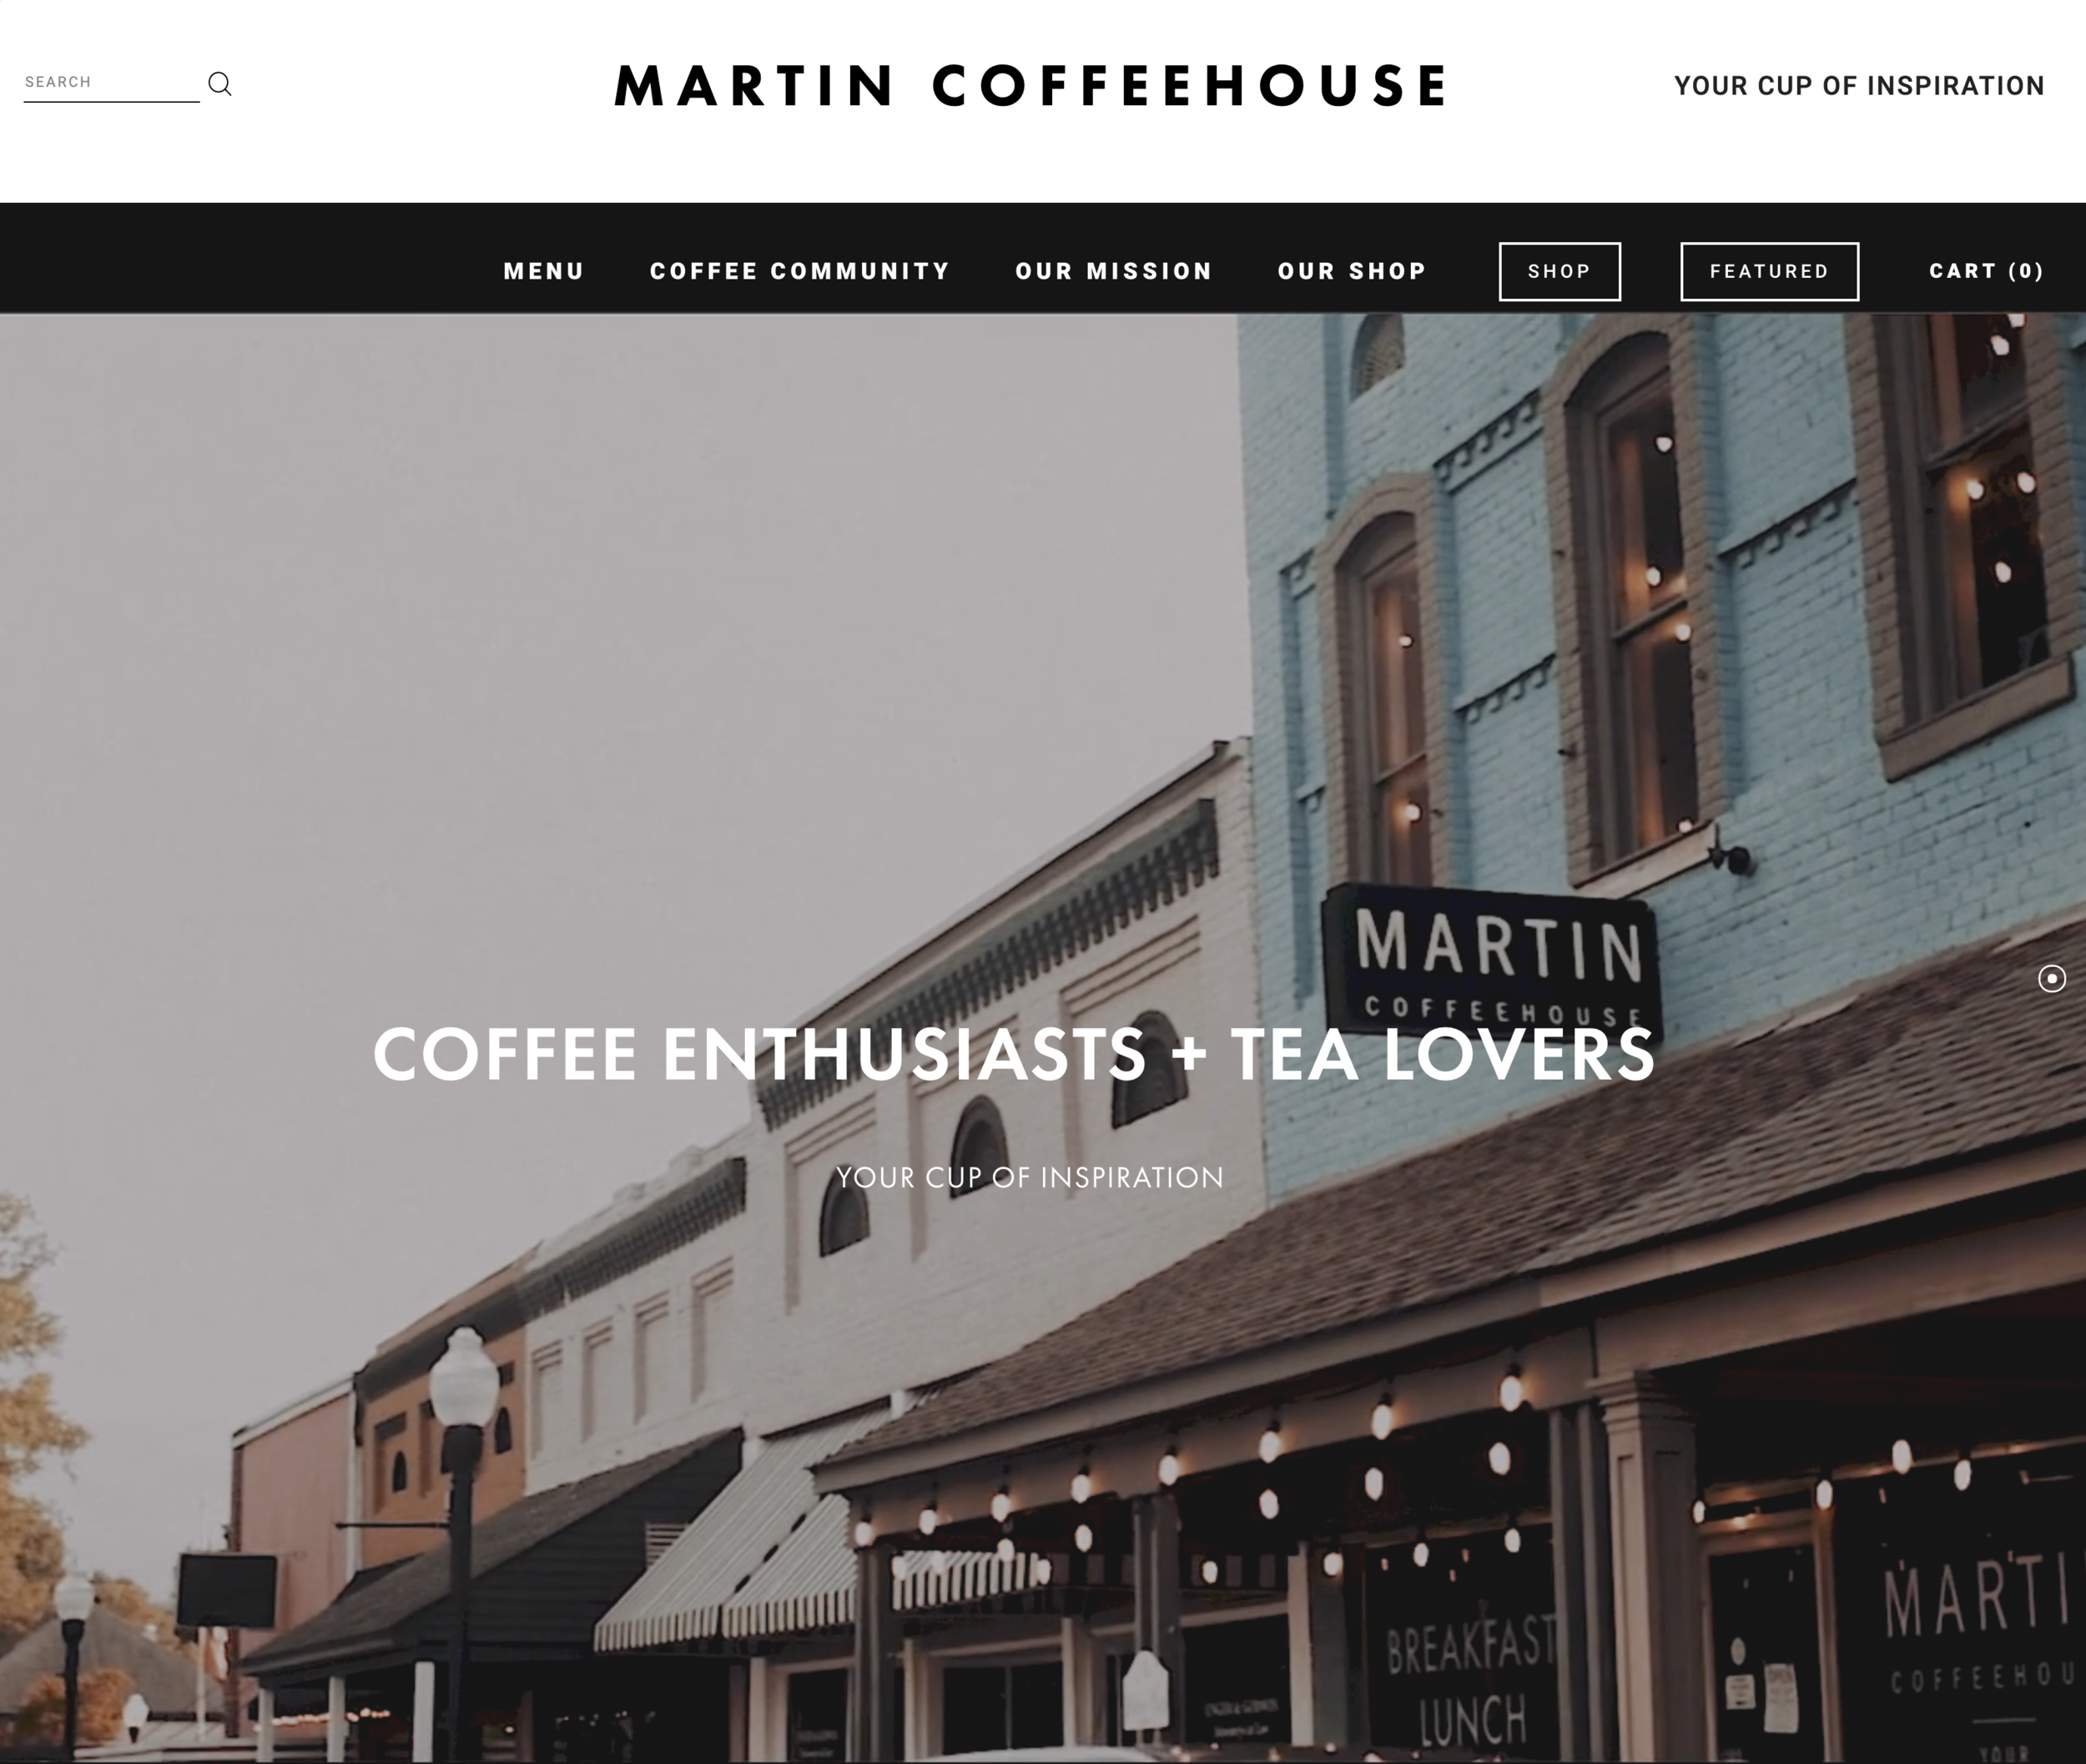 www.MartinCoffeehouse.com